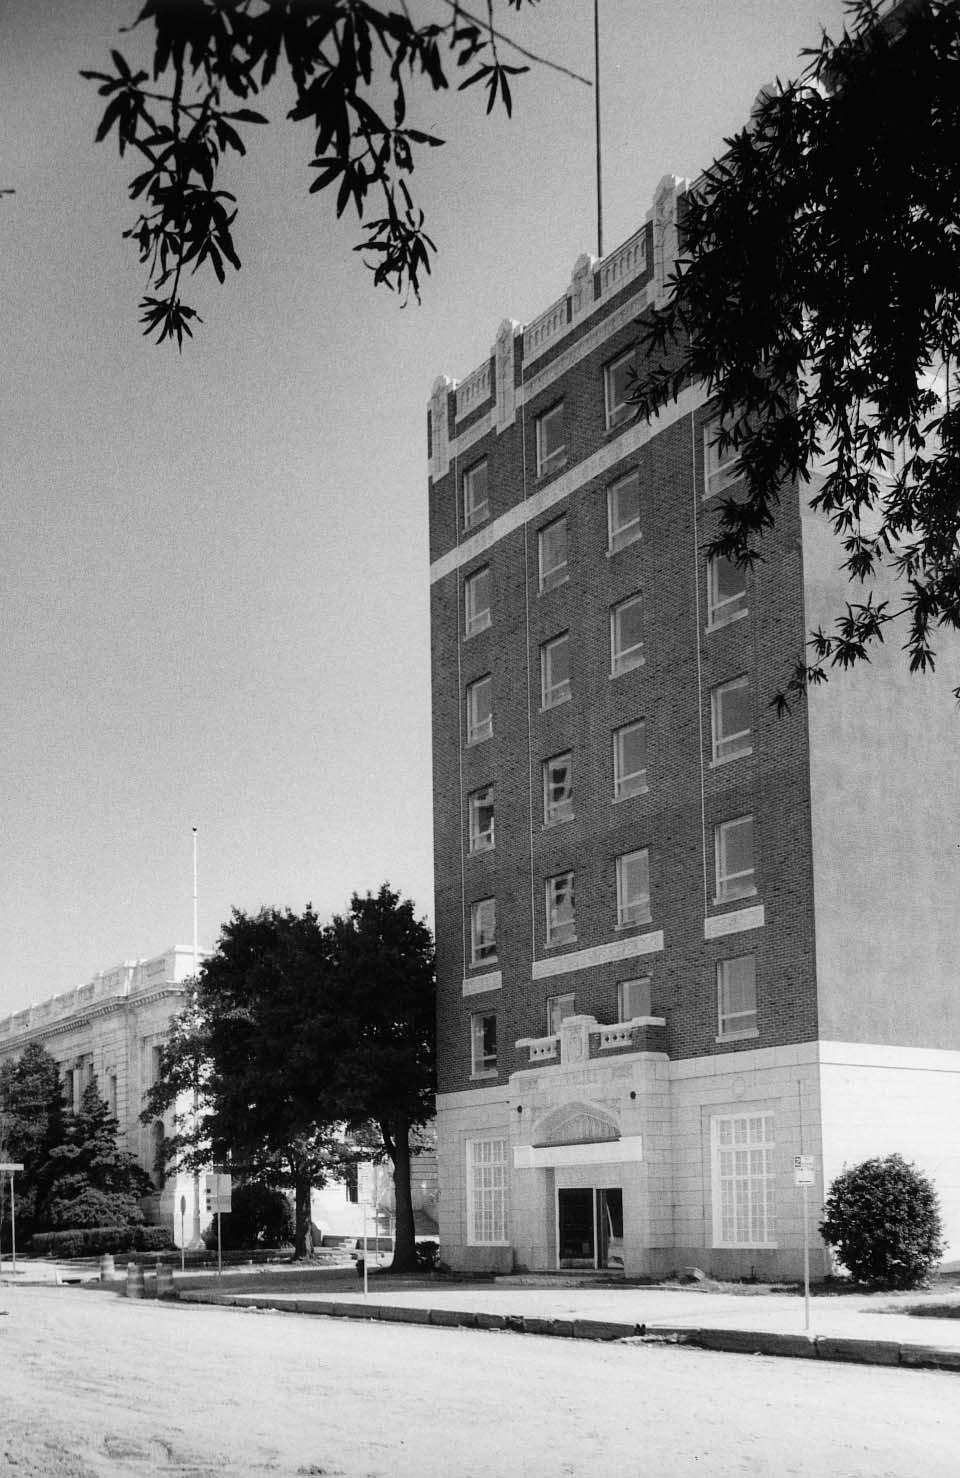 Hotel Warwick